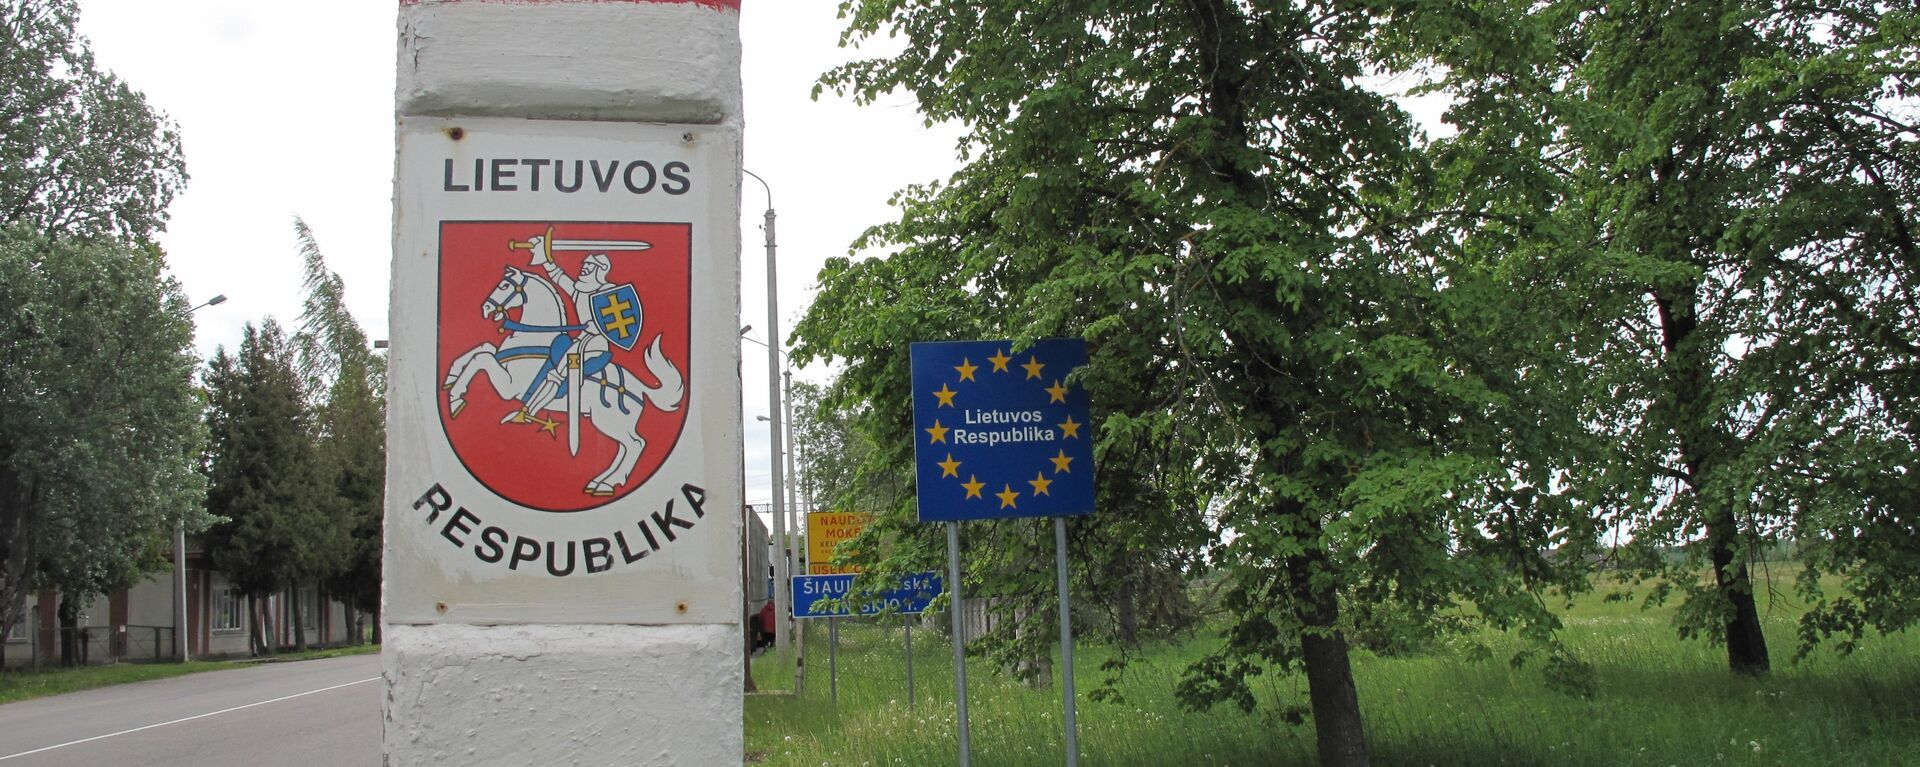 Граница Литвы - Sputnik Латвия, 1920, 24.06.2021